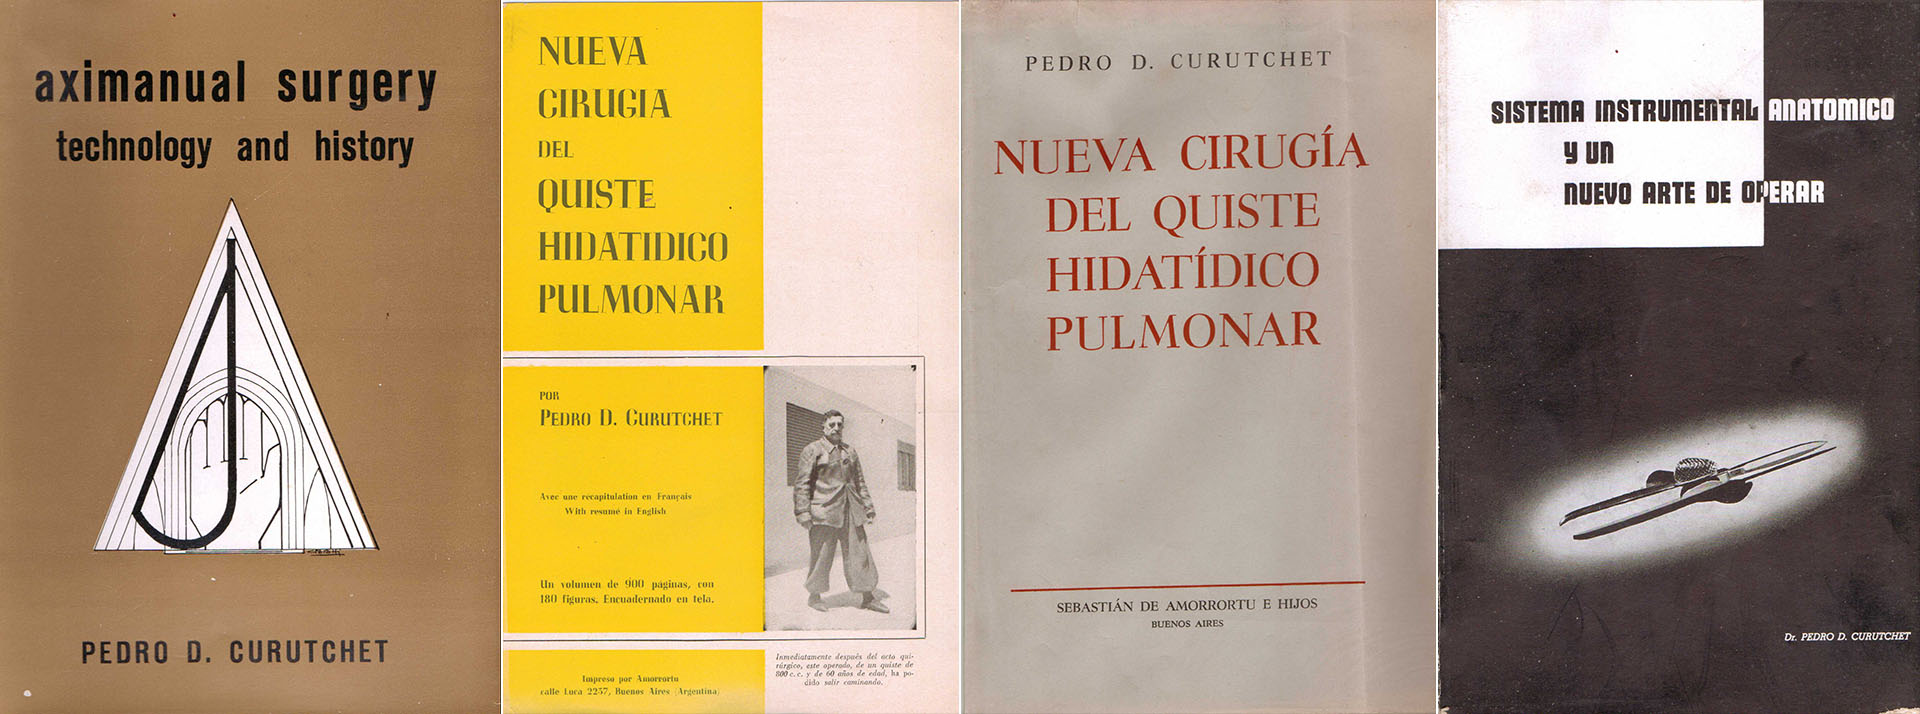 Diferentes libros publicados por Curutchet